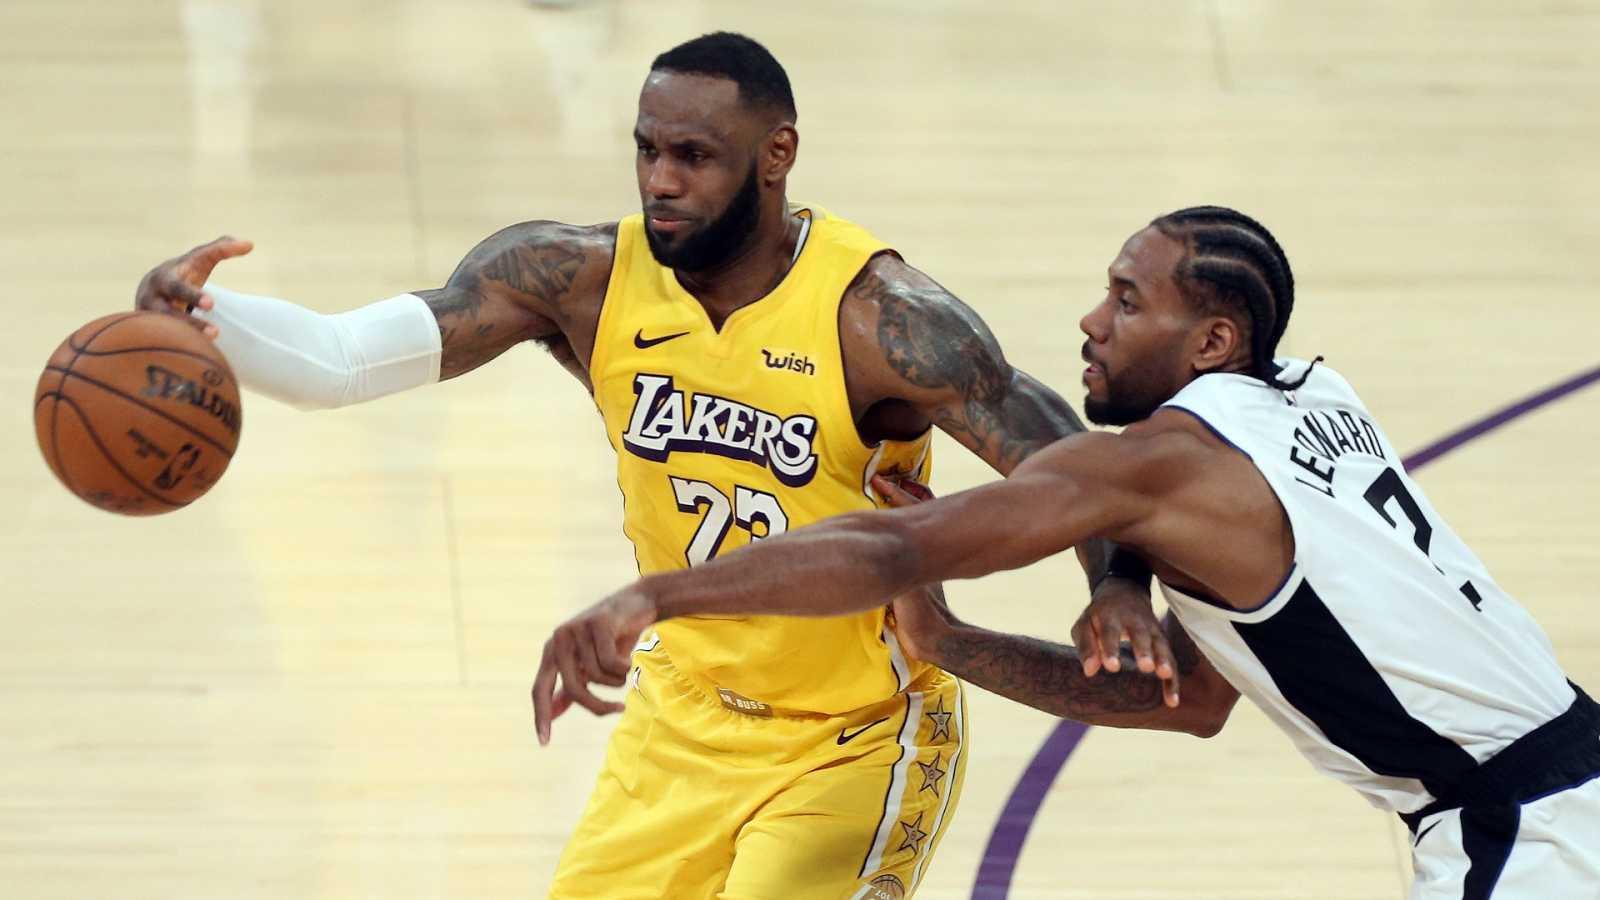 El alero de los Lakers, LeBron James le roba la pelota a Kawhi Leonard